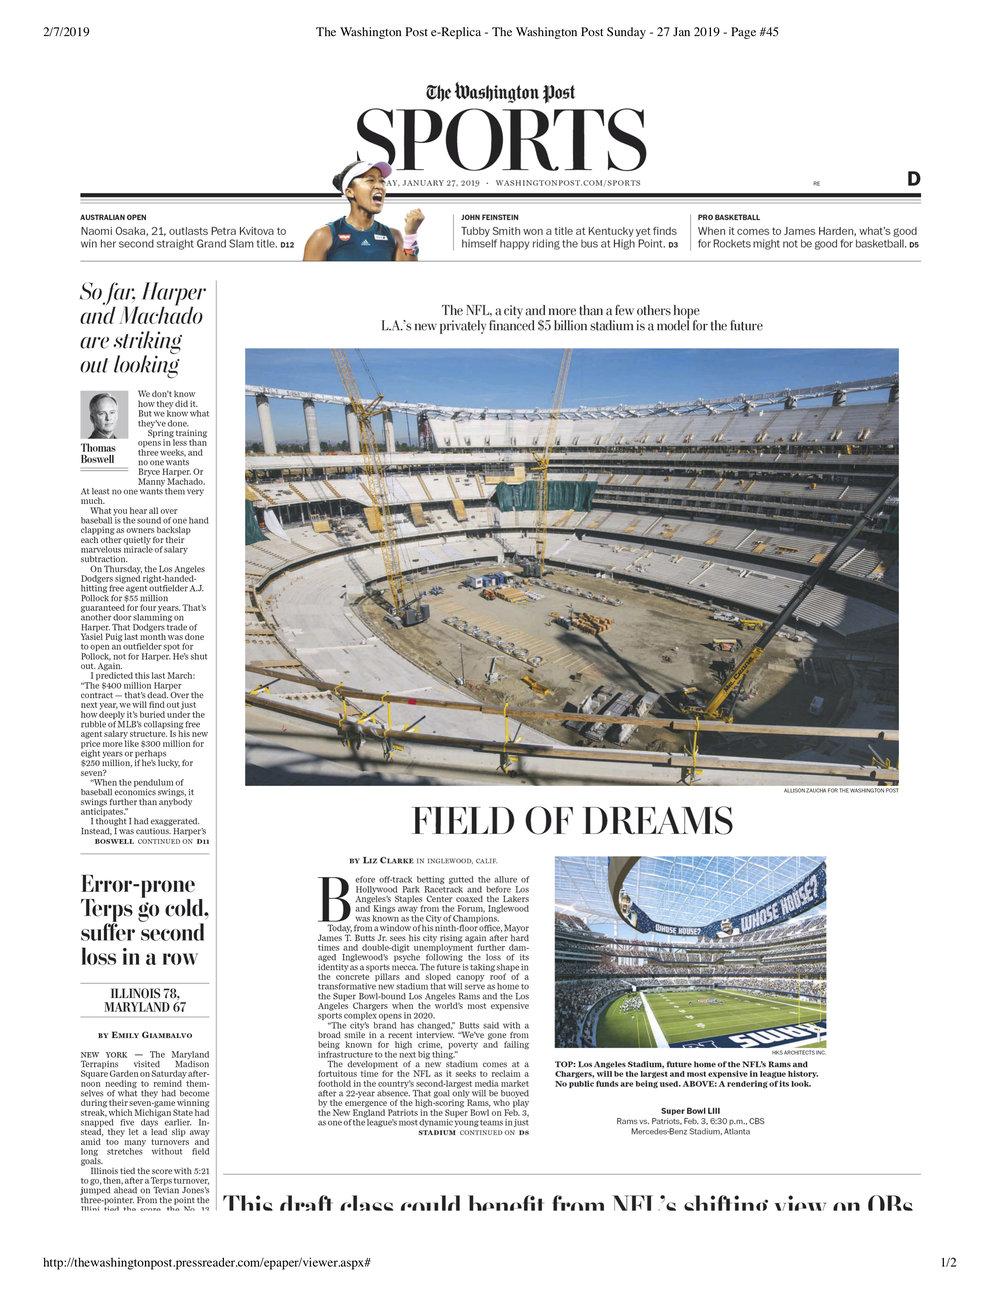 The Washington Post.jpg